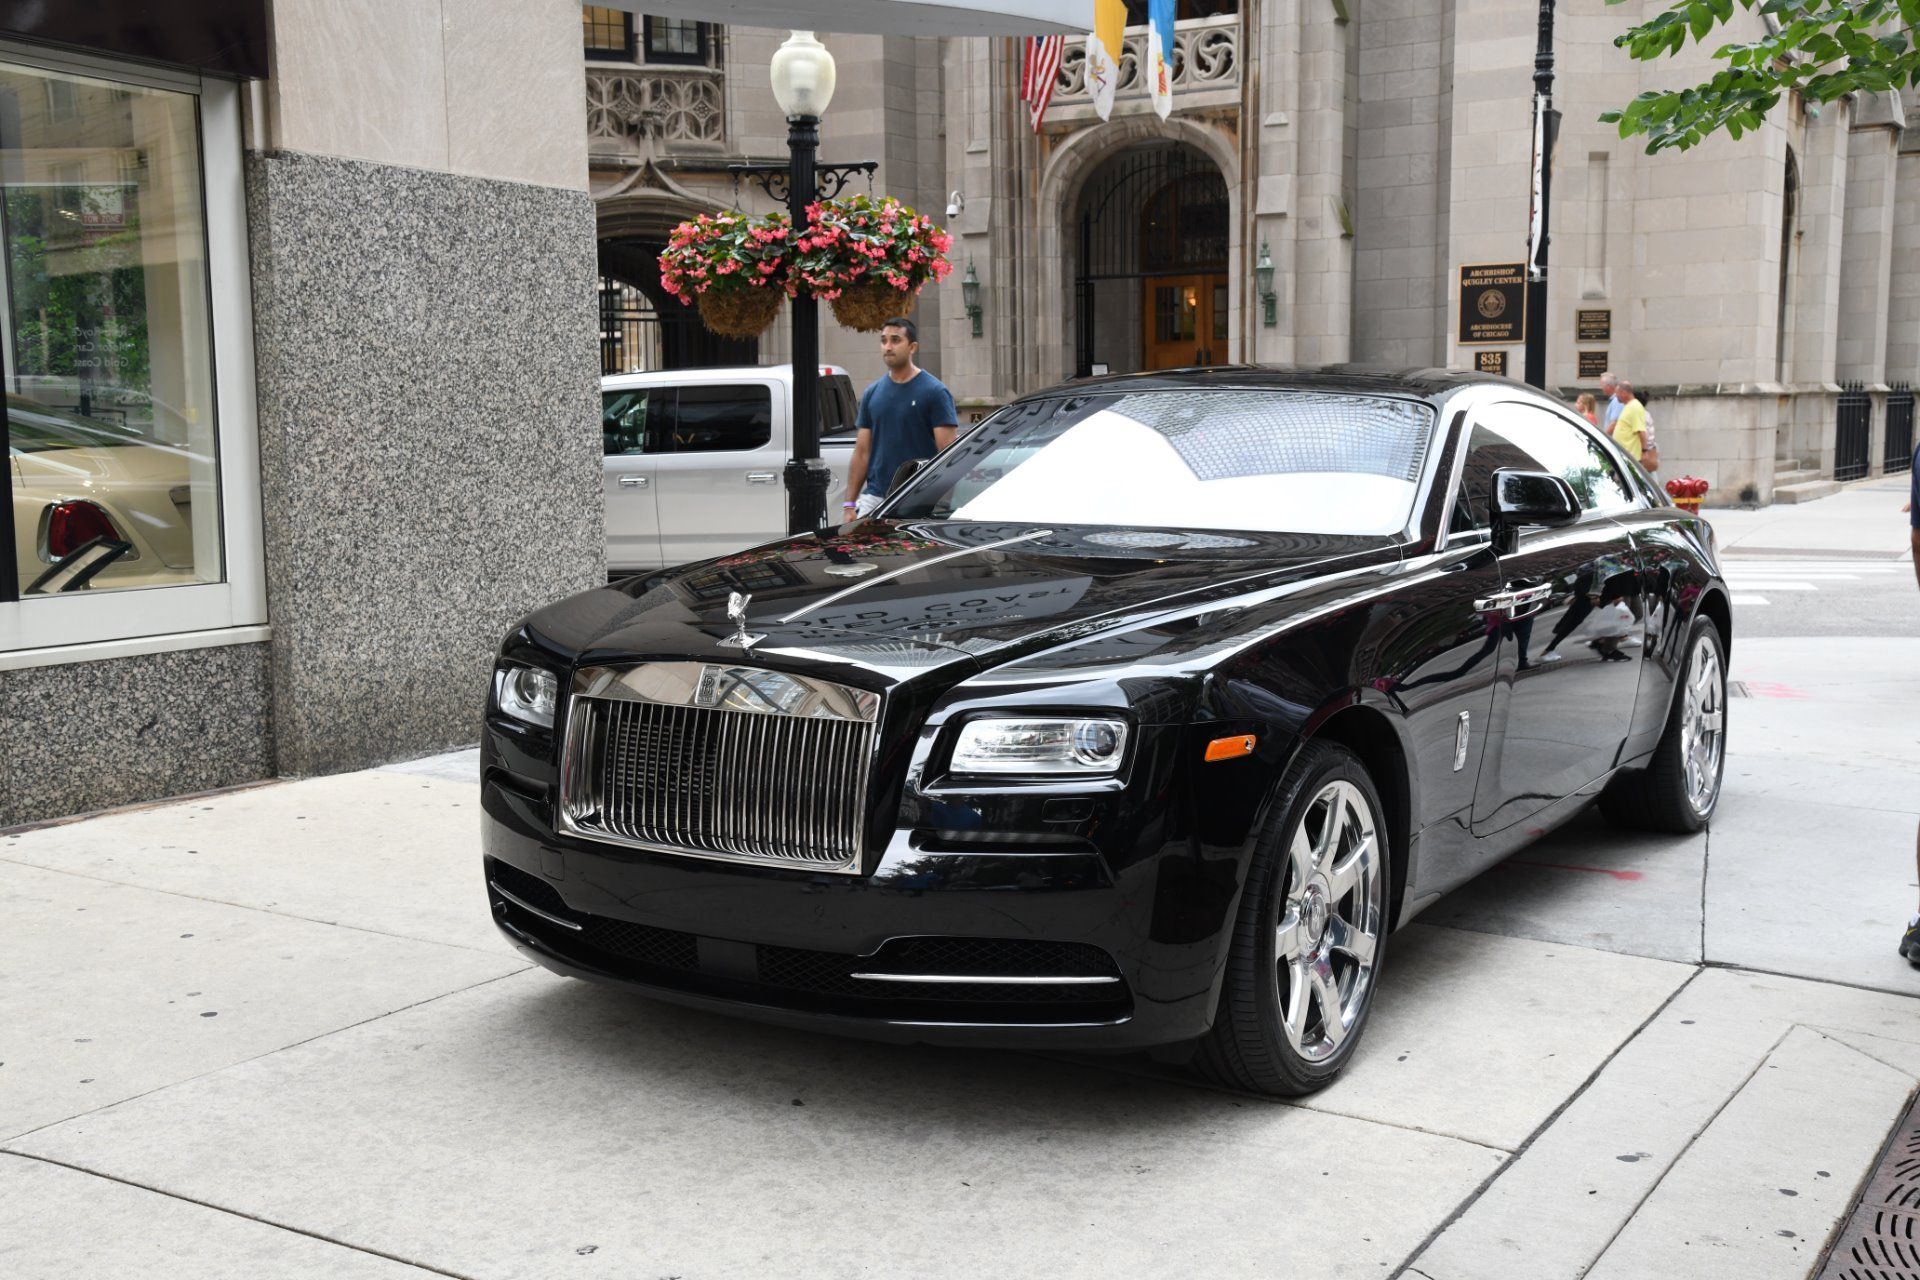 Used 2015 Rolls Royce Wraith Chicago Il Rolls Royce Rolls Royce Wraith Classic Cars